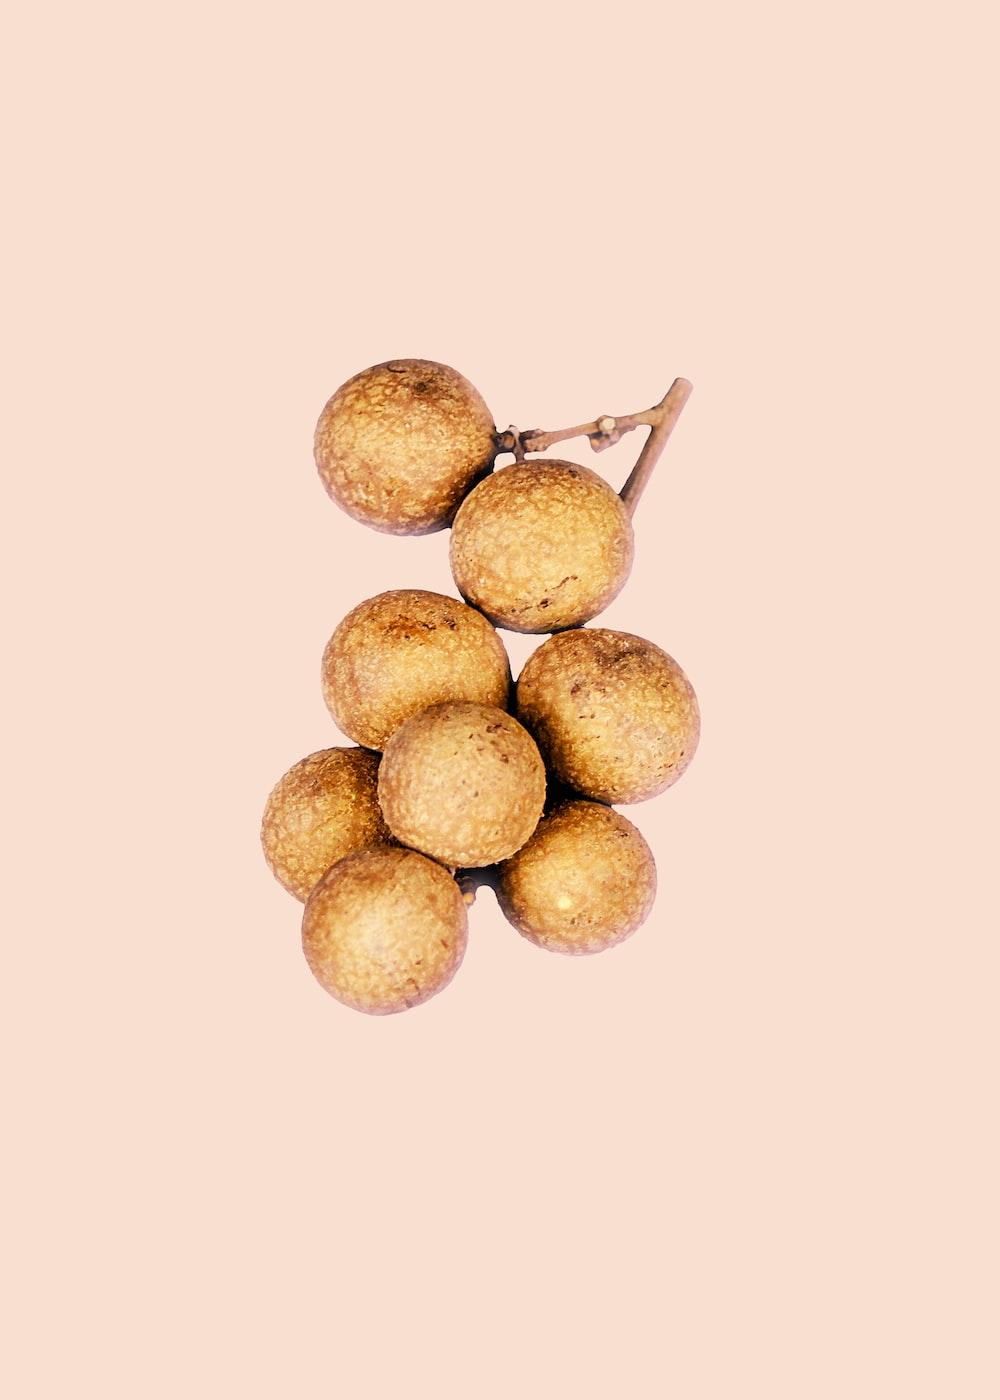 brown round fruit on white background